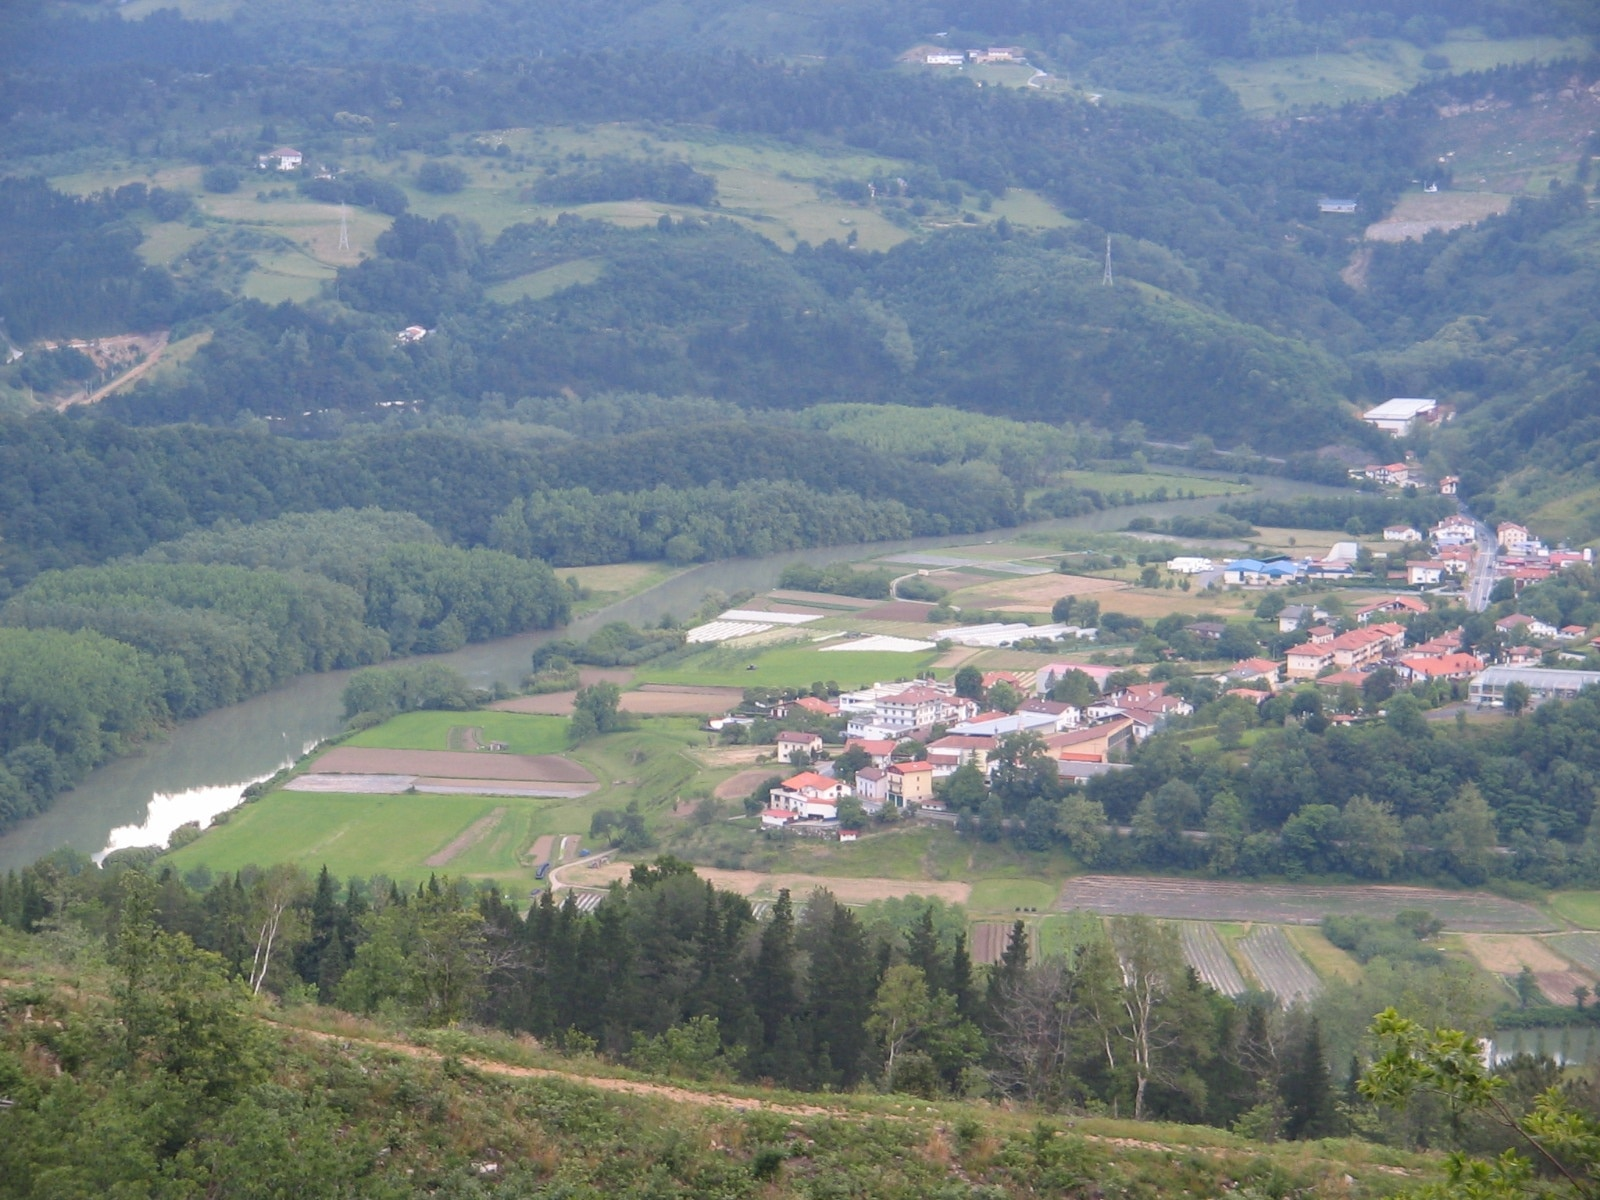 Usurbil, Basque Country, Spain